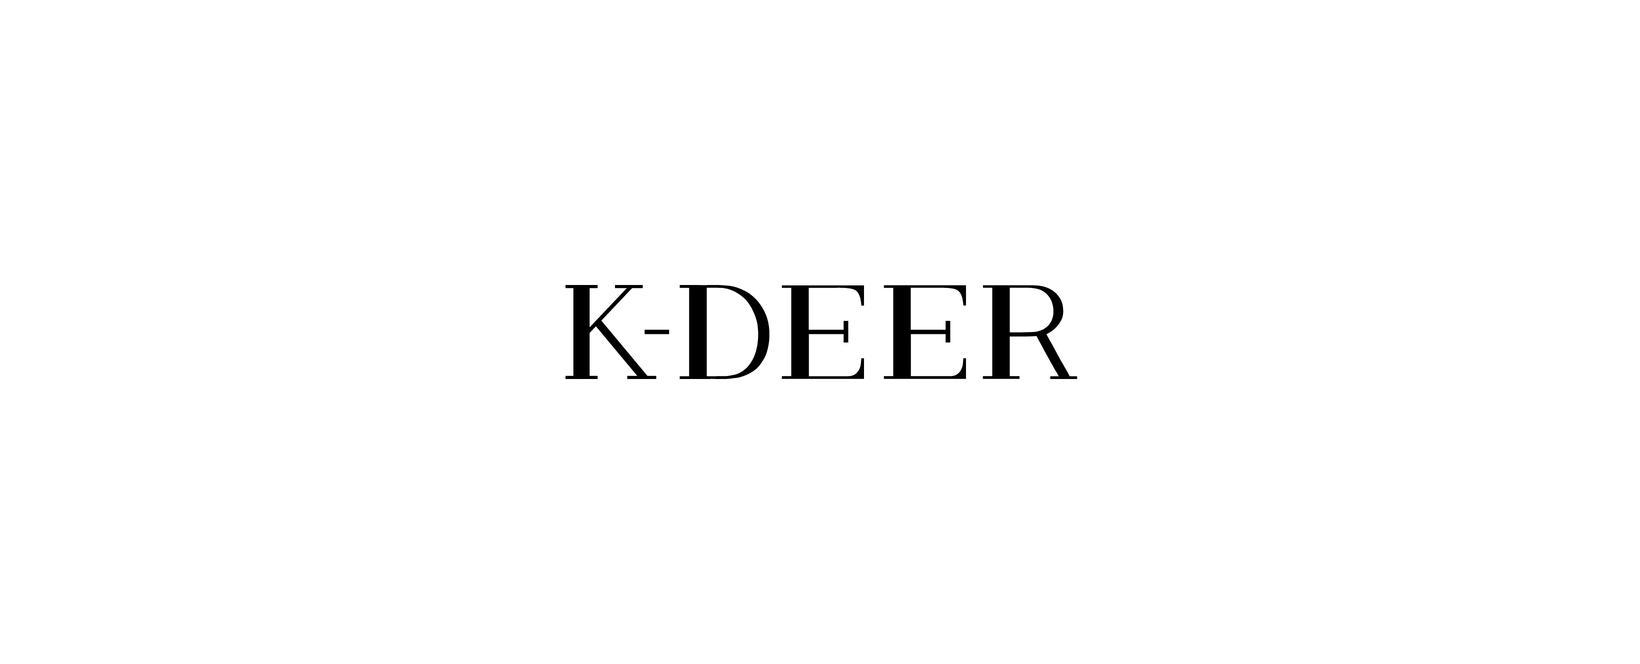 K-Deer Coupon Code 2021